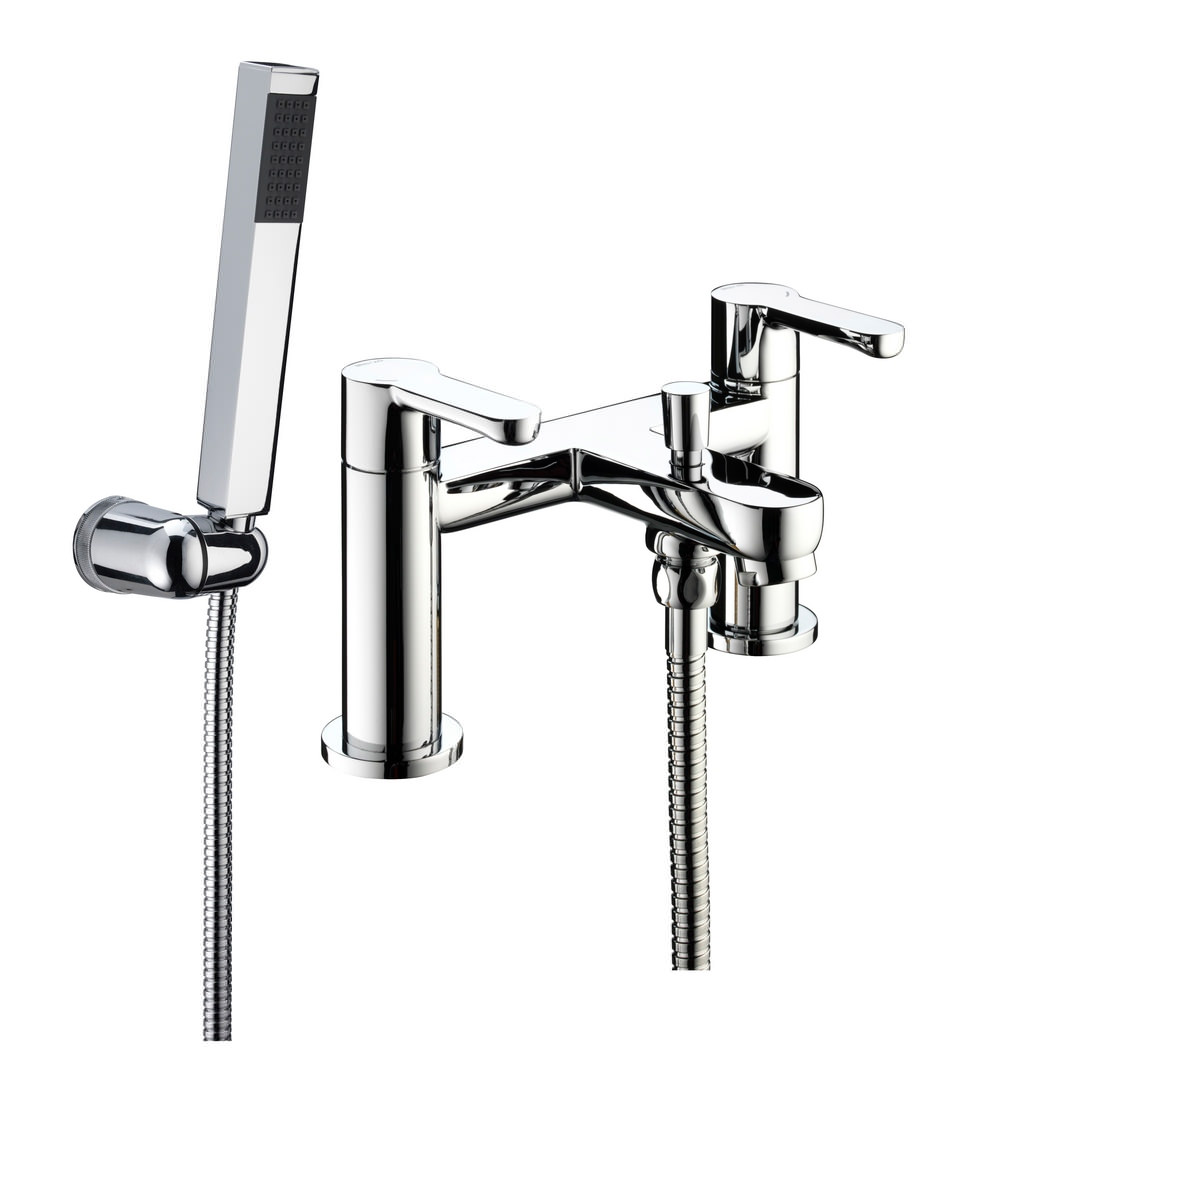 bristan nero bath shower mixer tap with shower kit. Black Bedroom Furniture Sets. Home Design Ideas